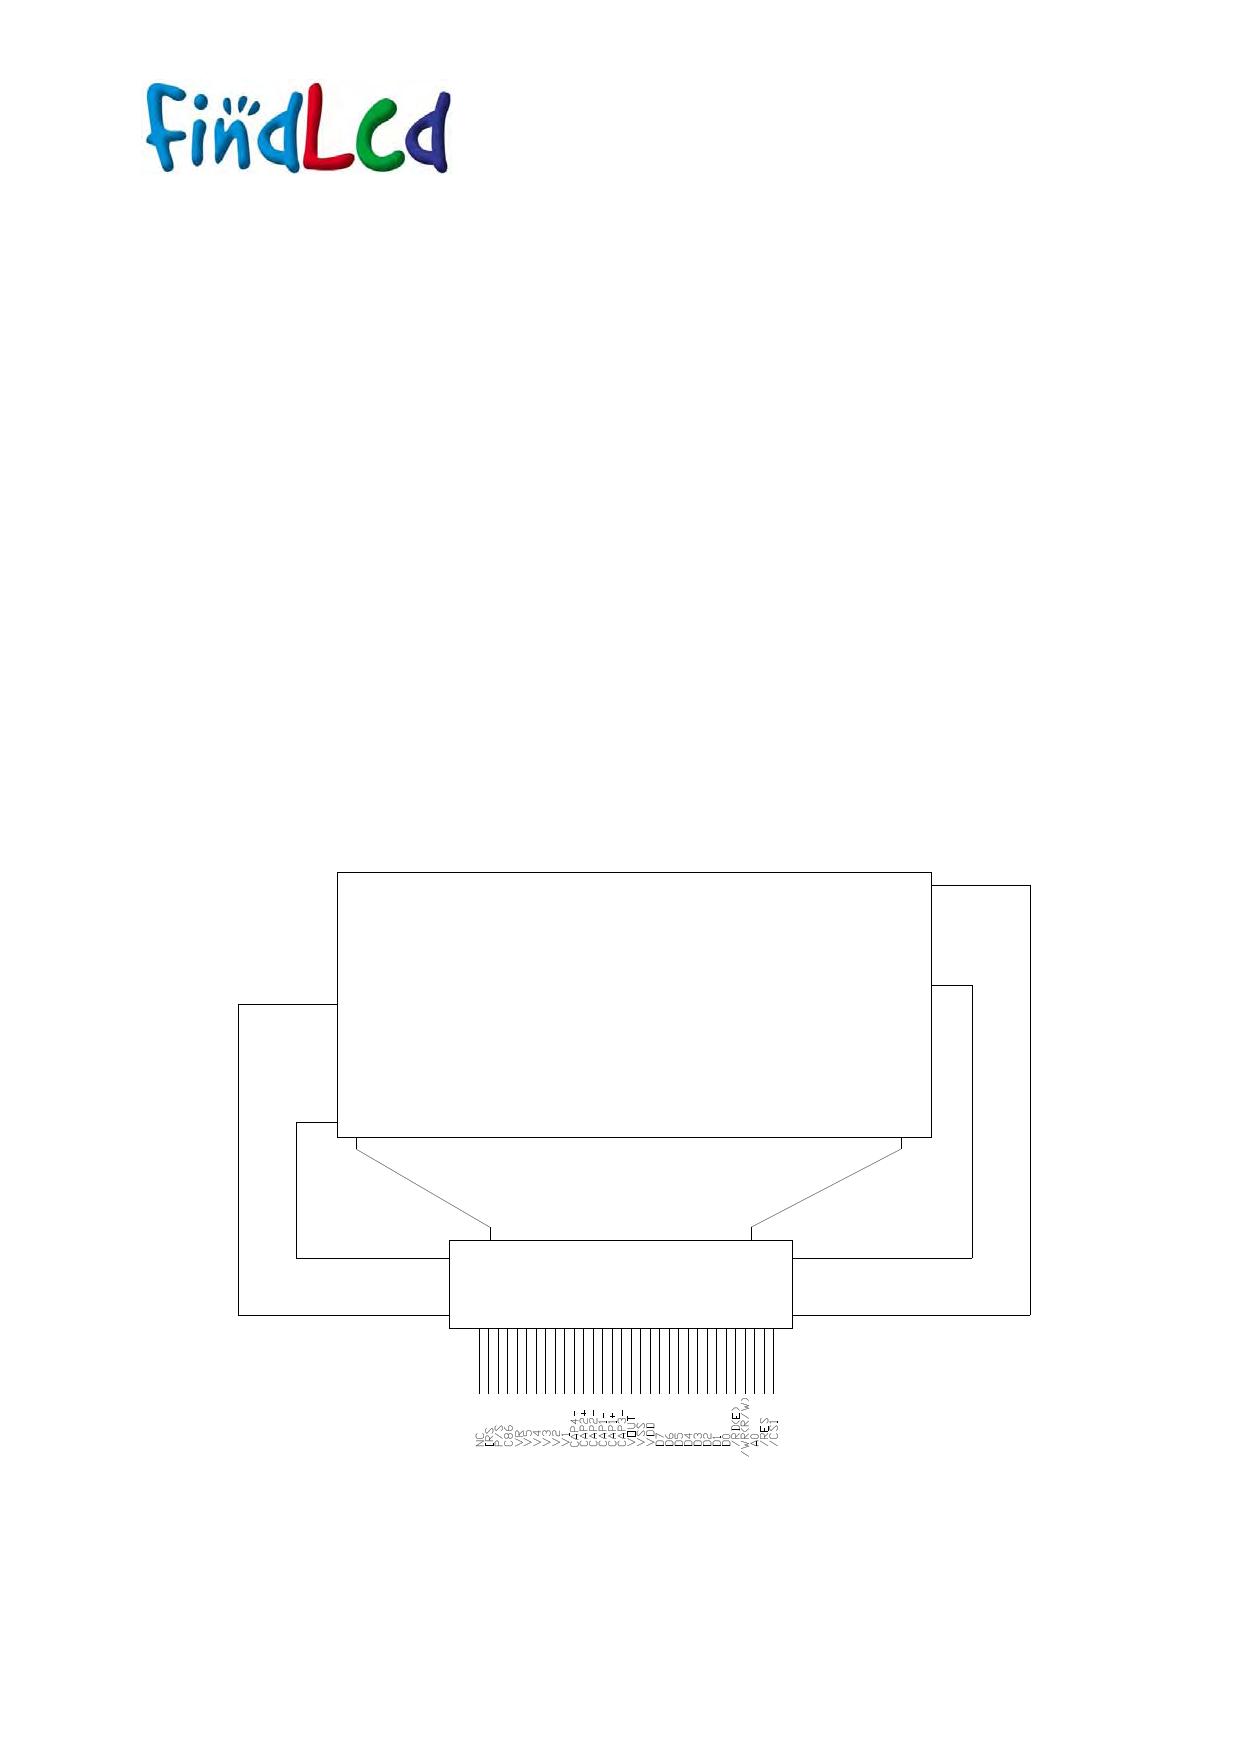 TM0027-Z-LED pdf, 반도체, 판매, 대치품